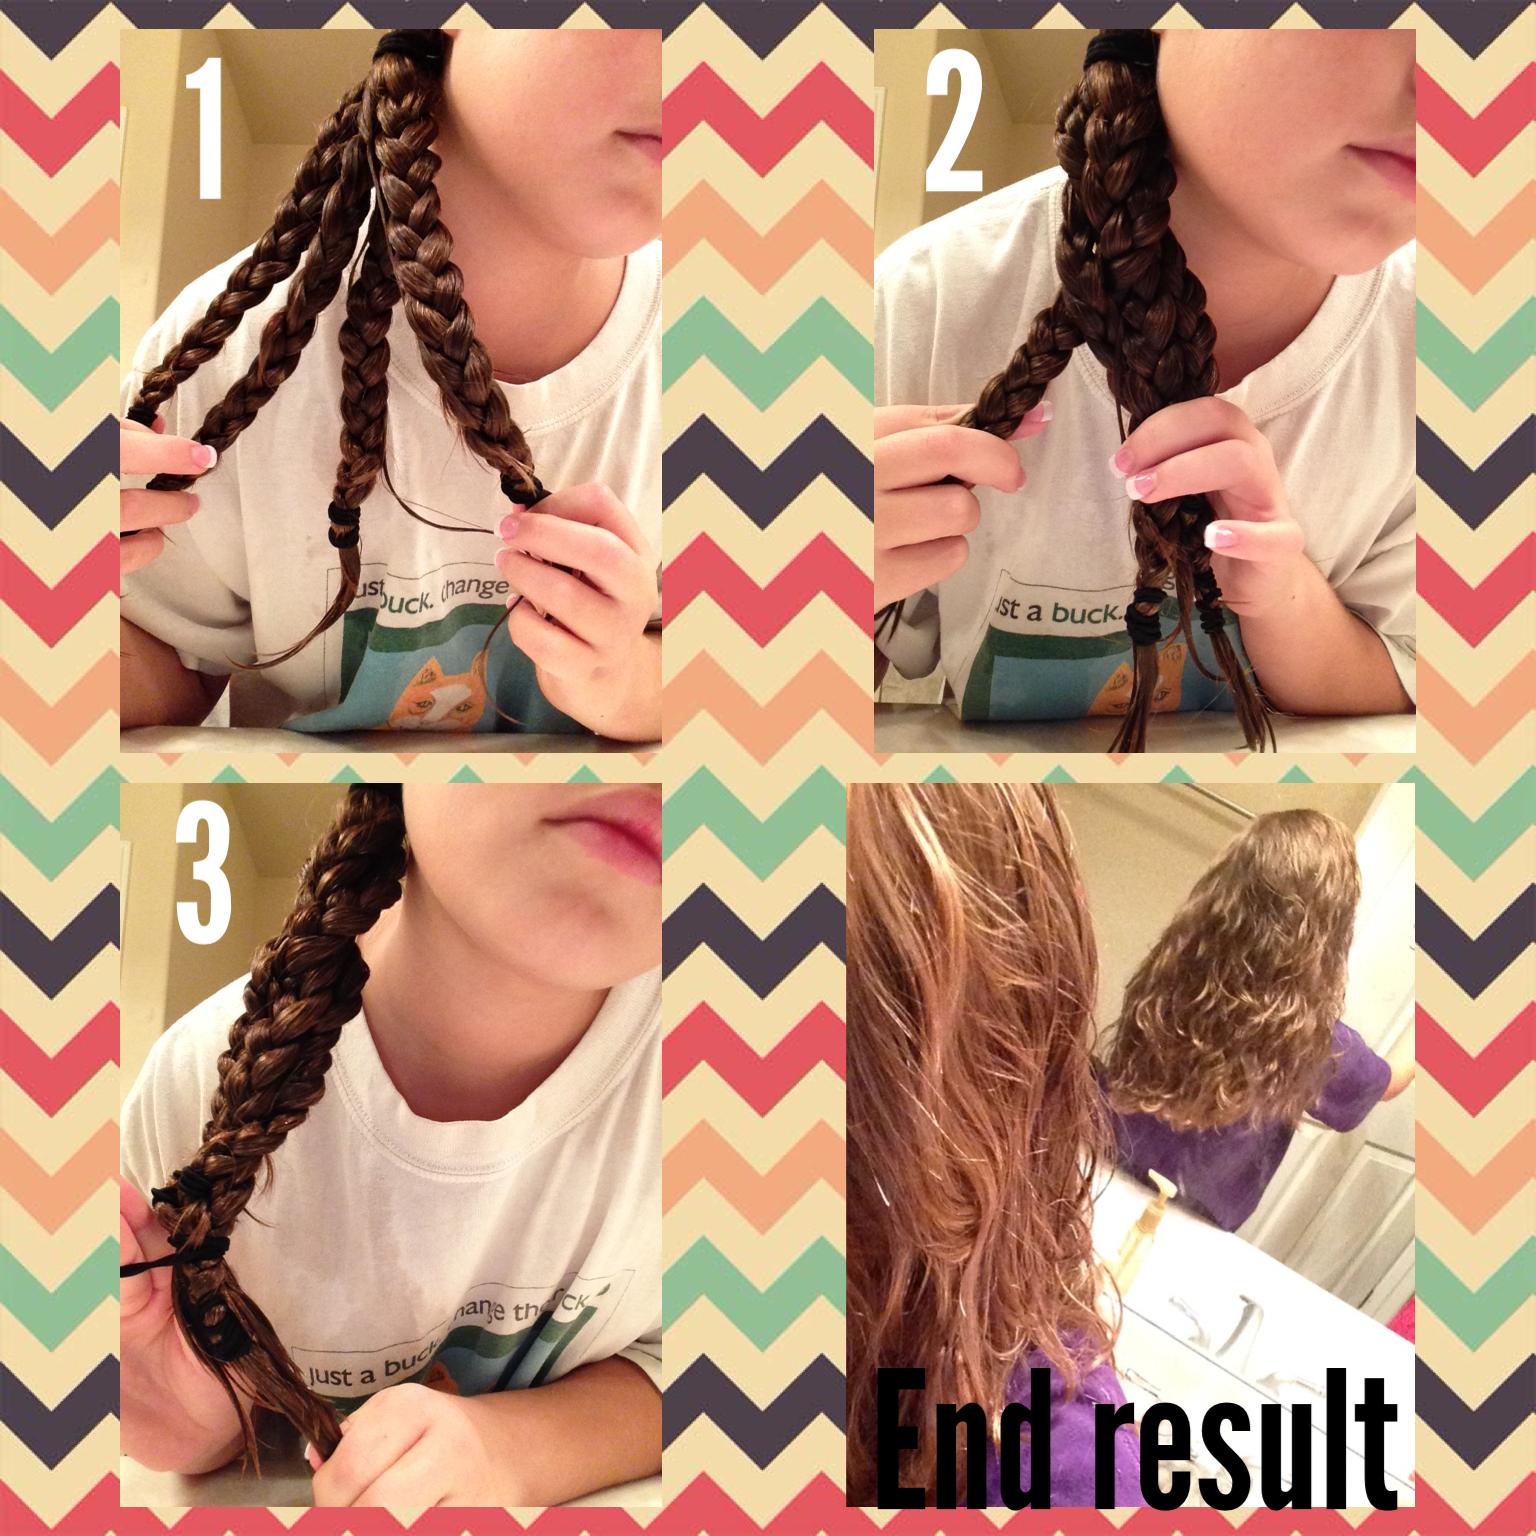 Curly Hair Tutorial For Wet Hair 1 Put Hair In Three Separate Braids When Hair Is Wet 2 Leave In Overnight 3 Wavy Hair Overnight Wavy Hair With Braid Face Hair